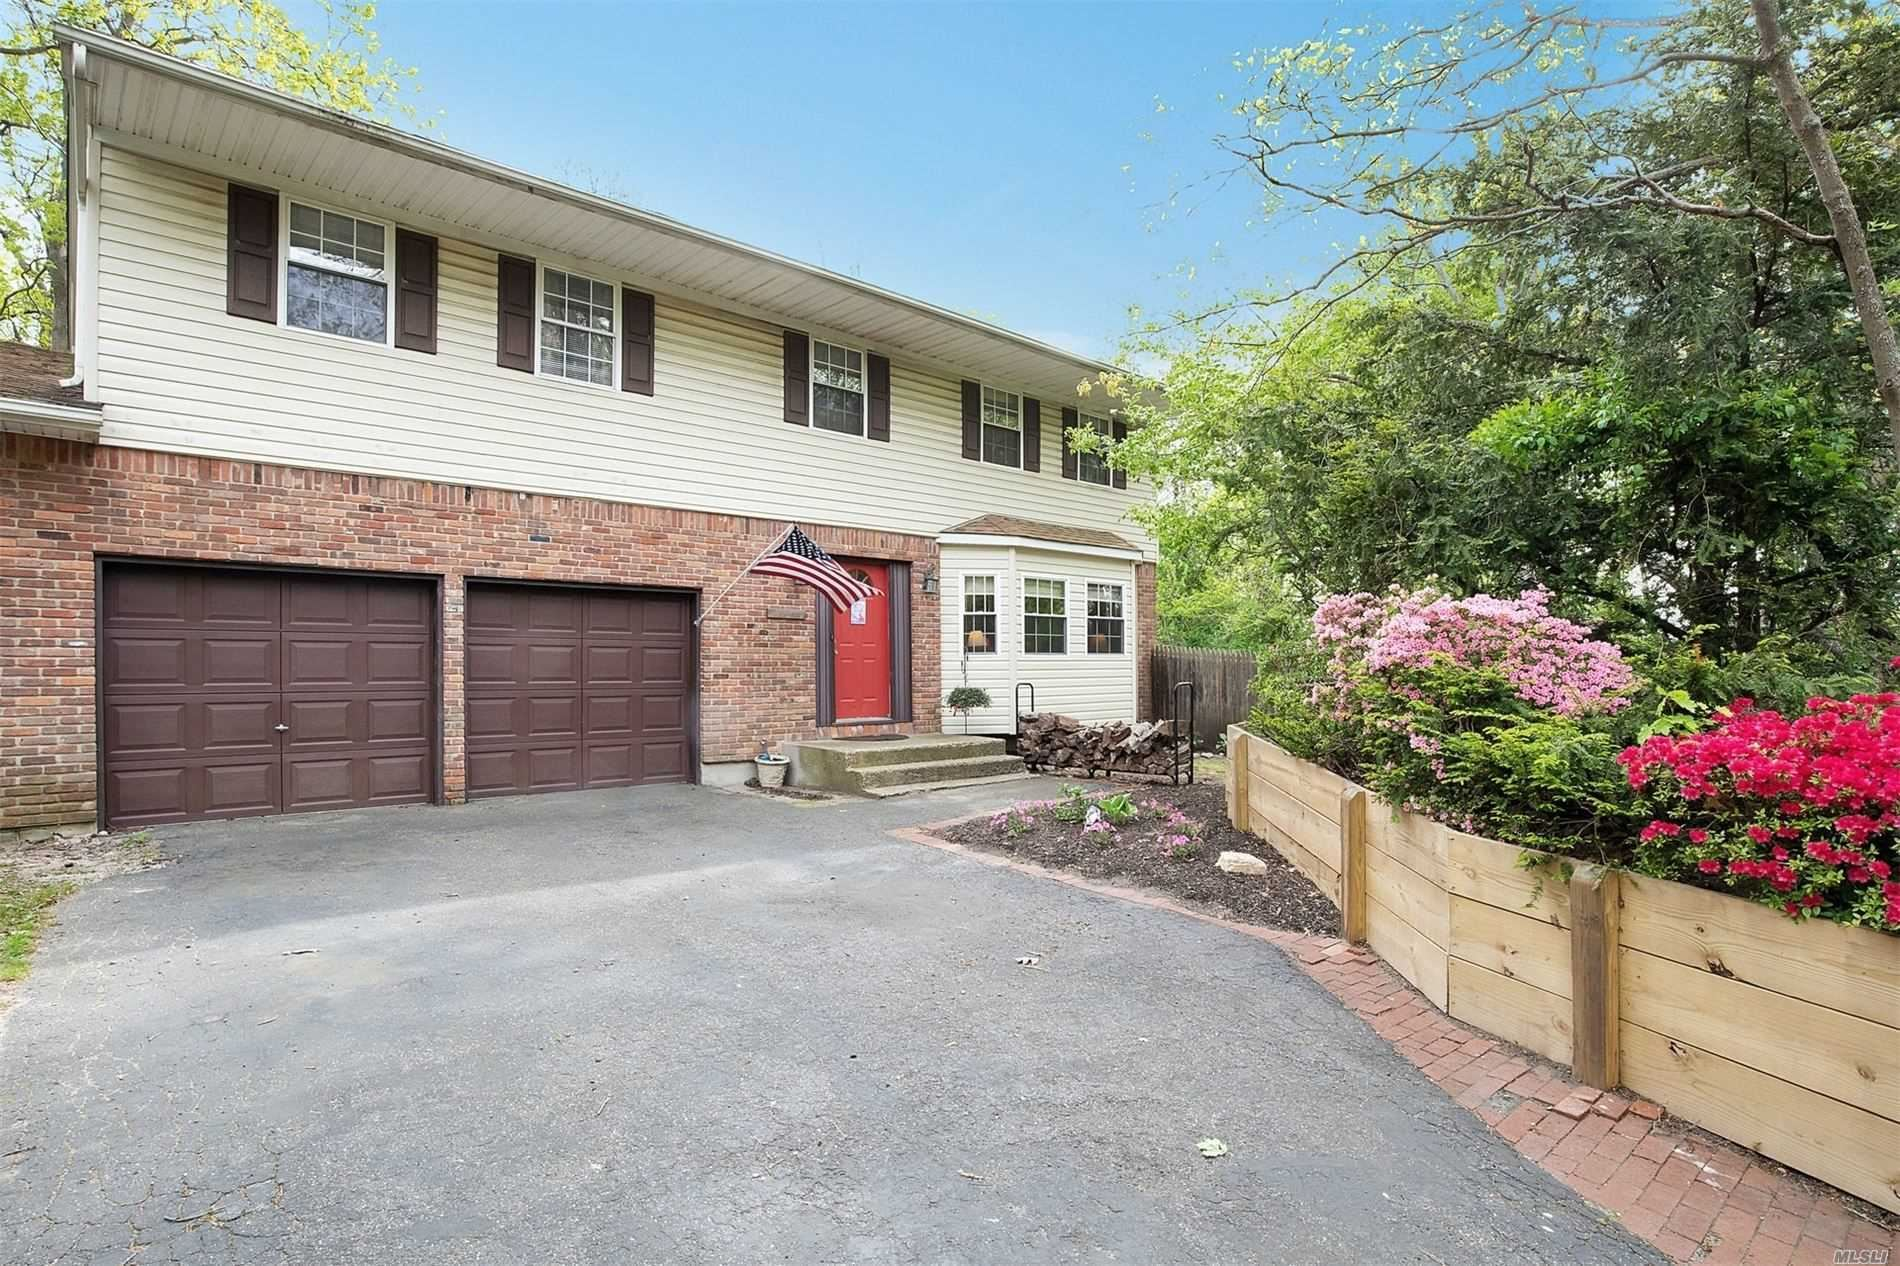 4 Firwood Drive, Farmingville, NY 11738 - MLS#: 3216544